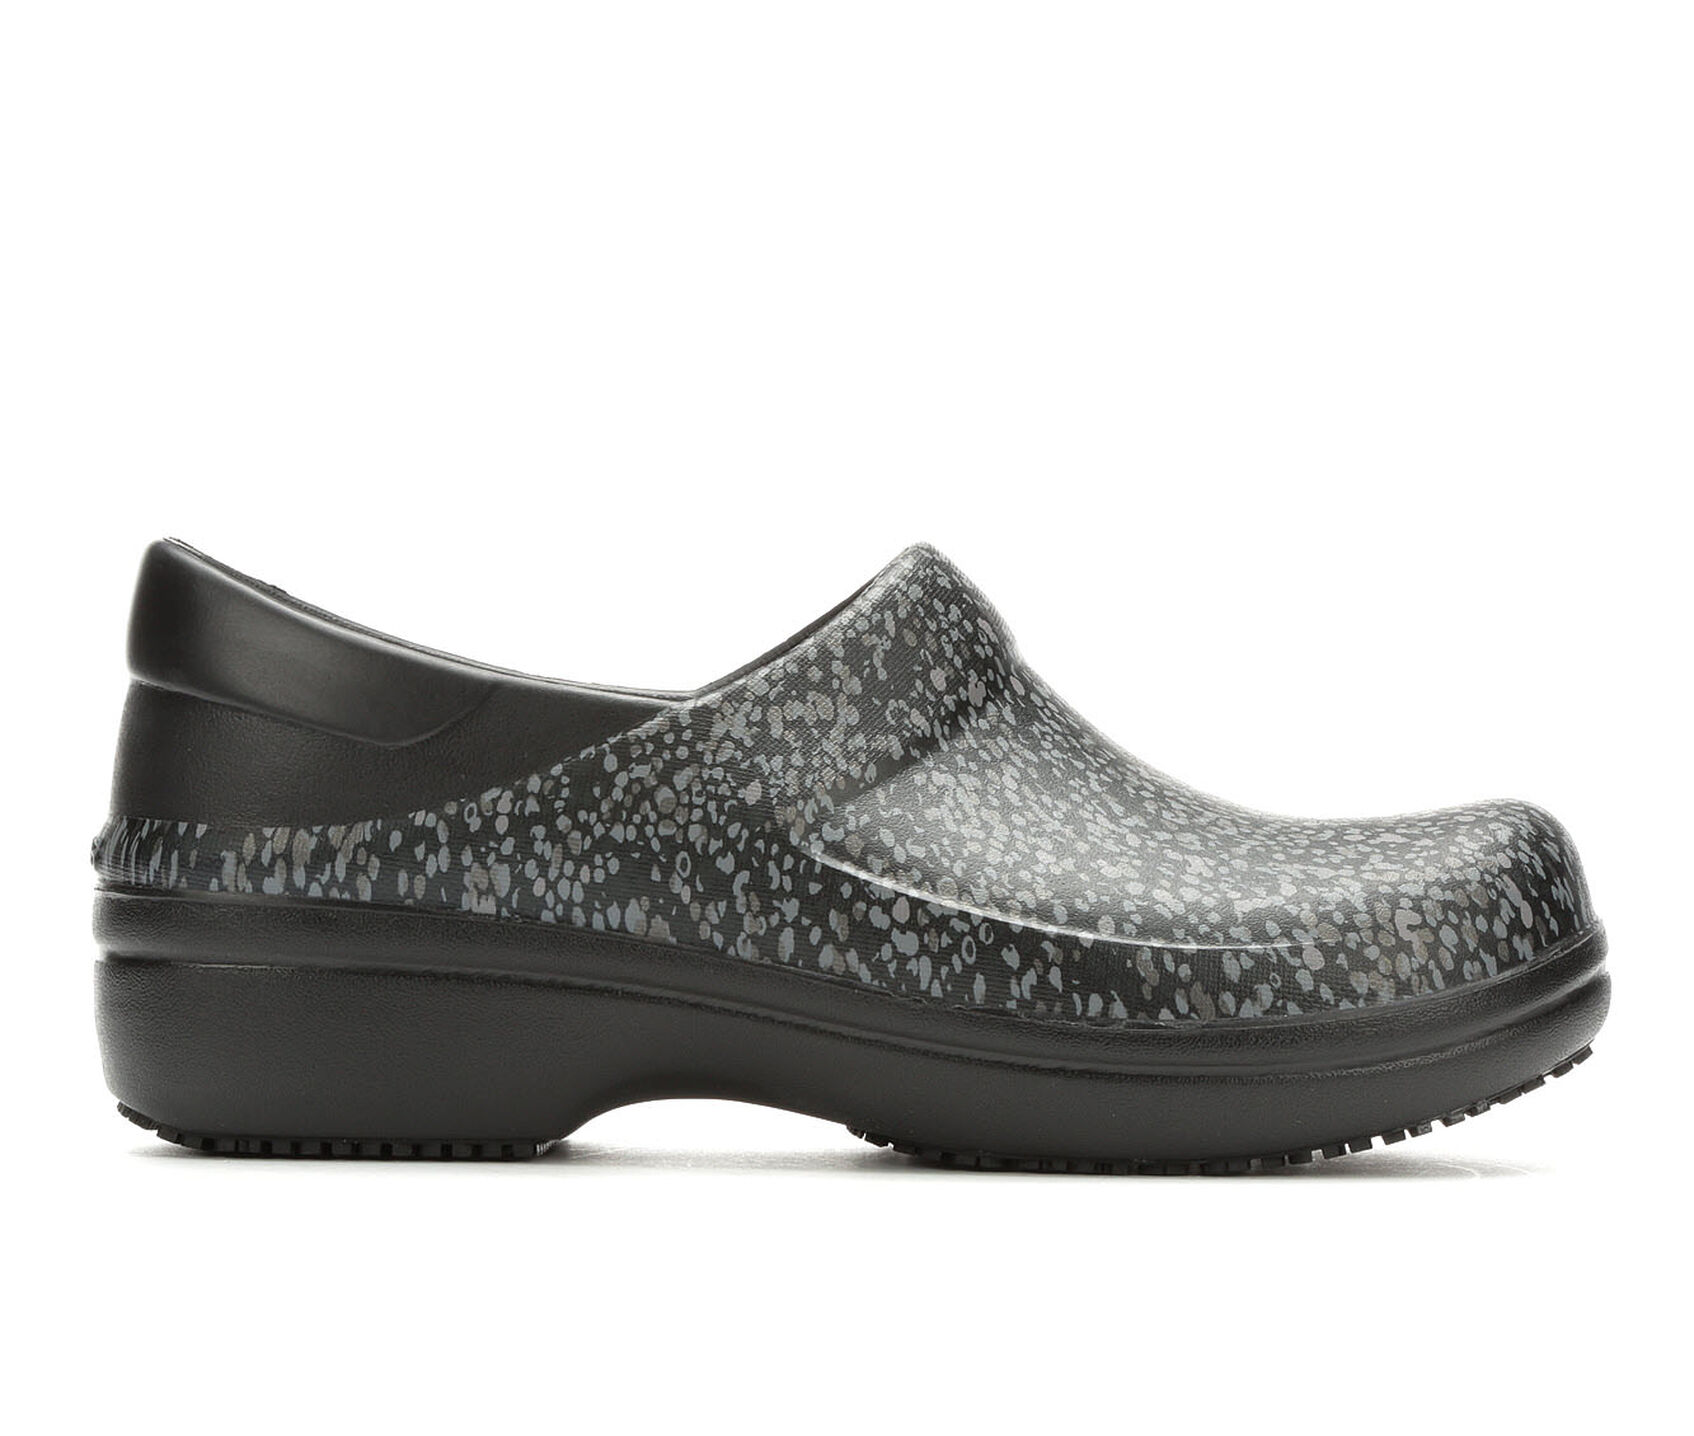 8f676ed5f5ee11 ... Crocs Work Neria Pro II Graphic Slip-Resistant Clogs. Previous